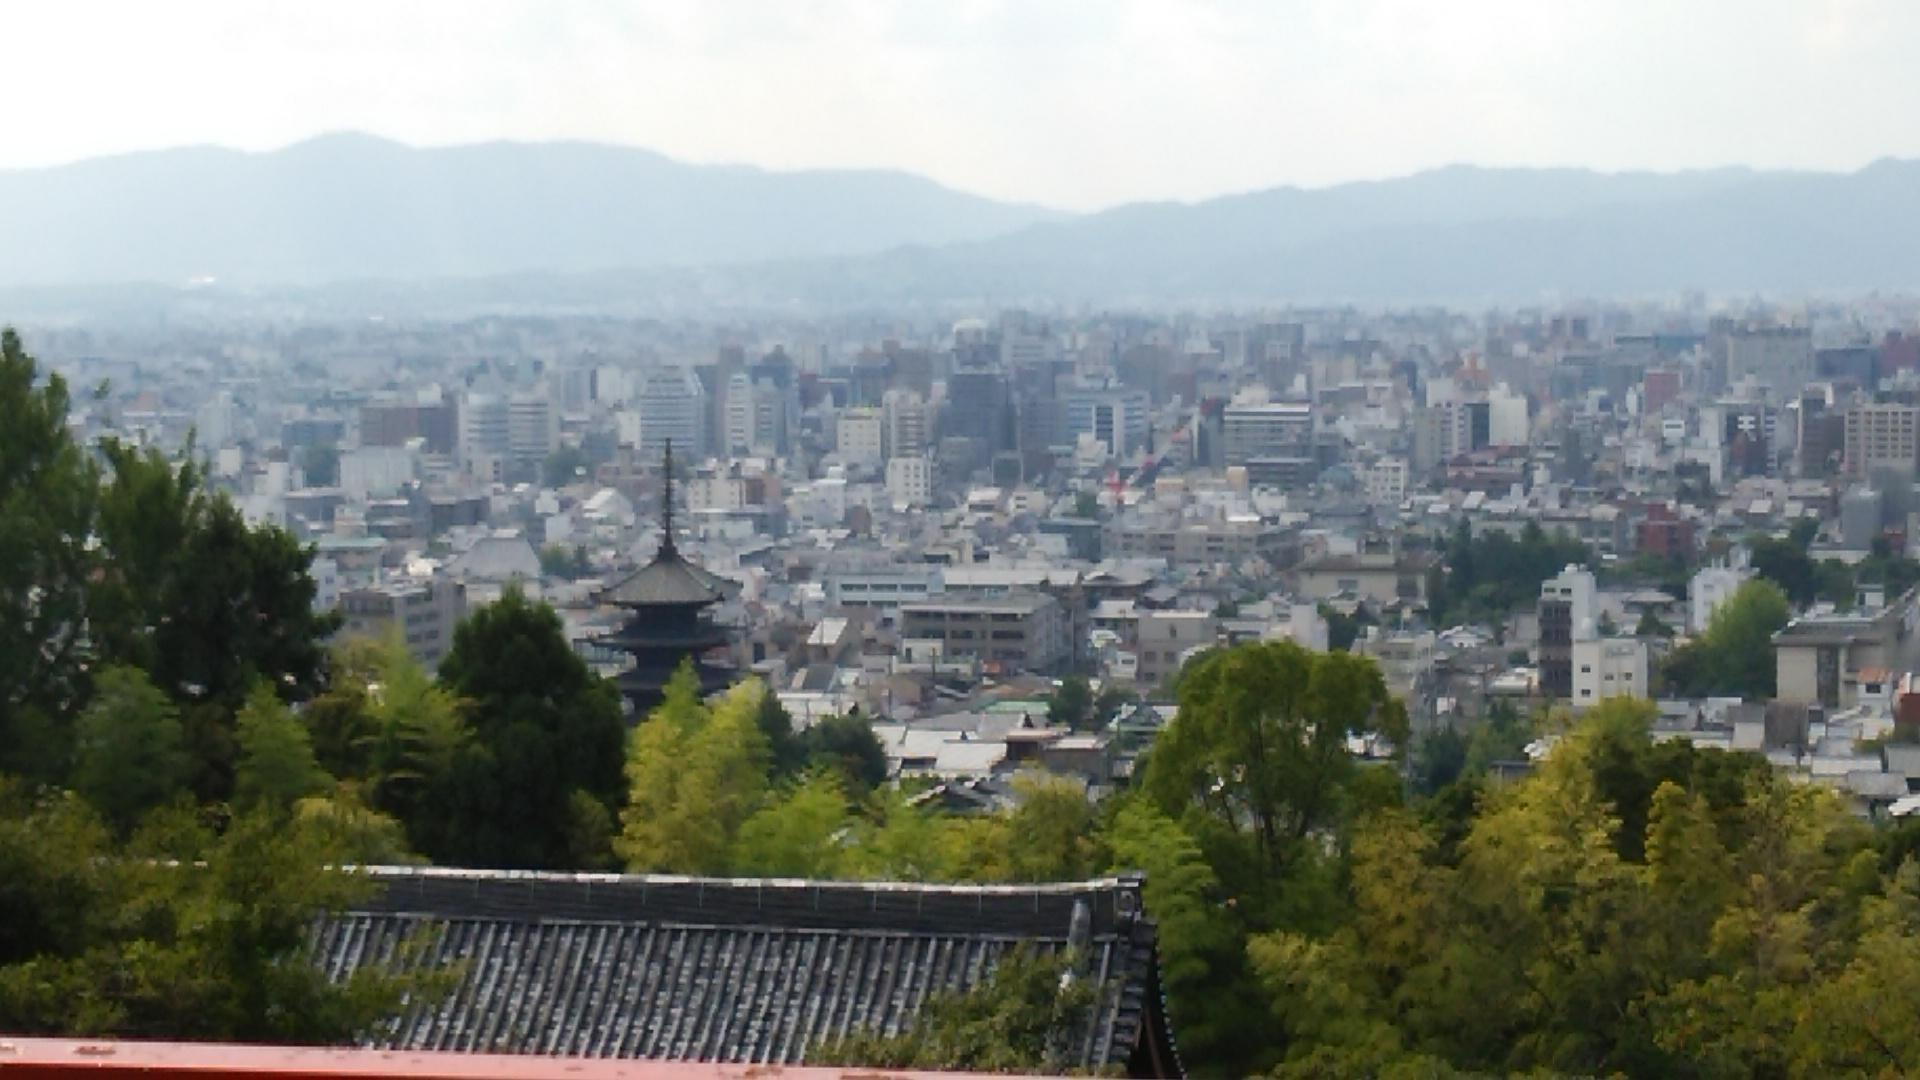 京都霊山護國神社の景色